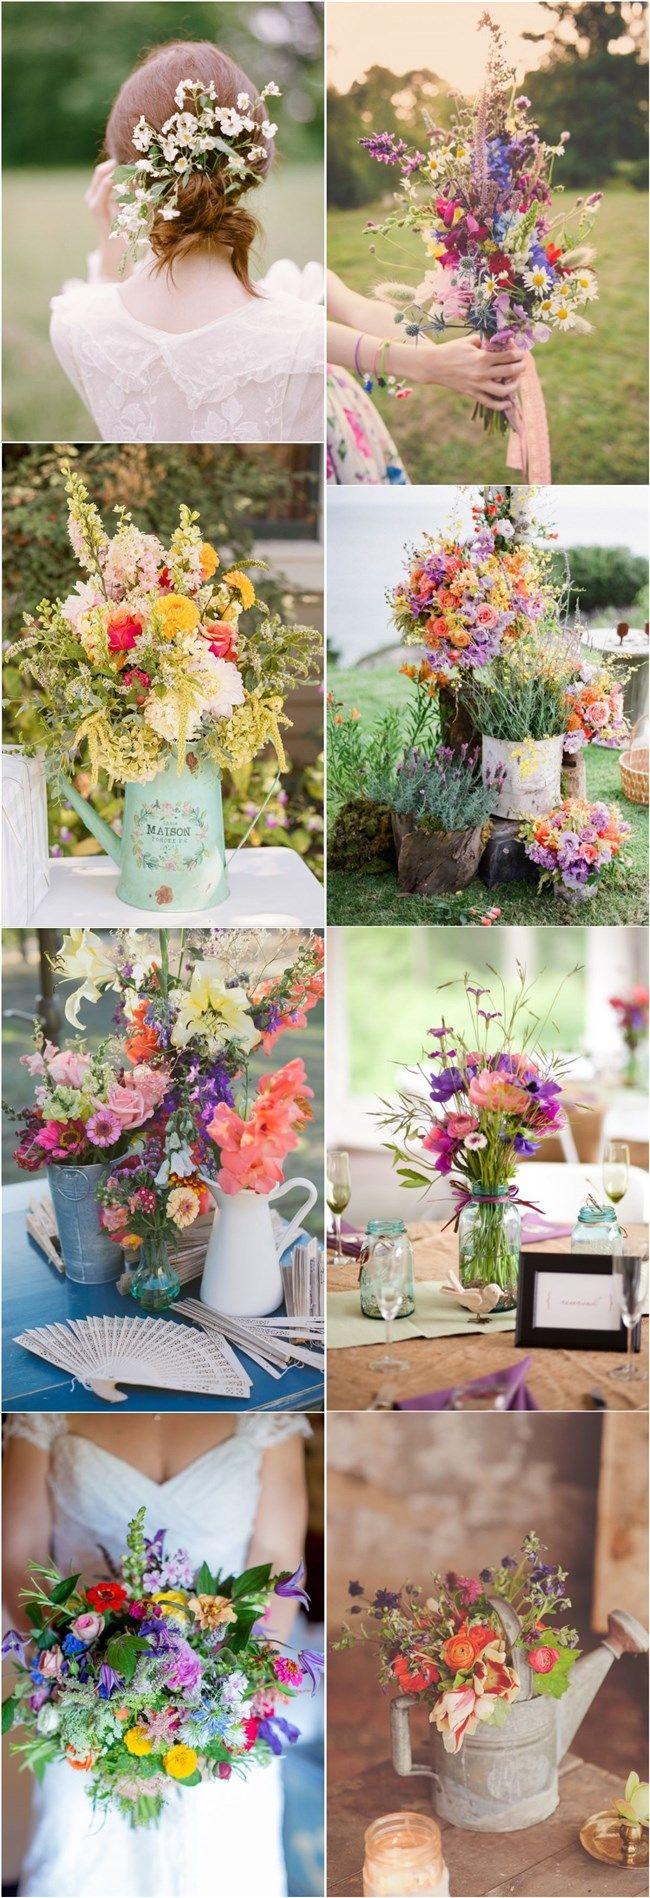 Wedding decorations with lights november 2018  Wildflowers Wedding Ideas for Rustic  Boho Weddings  November